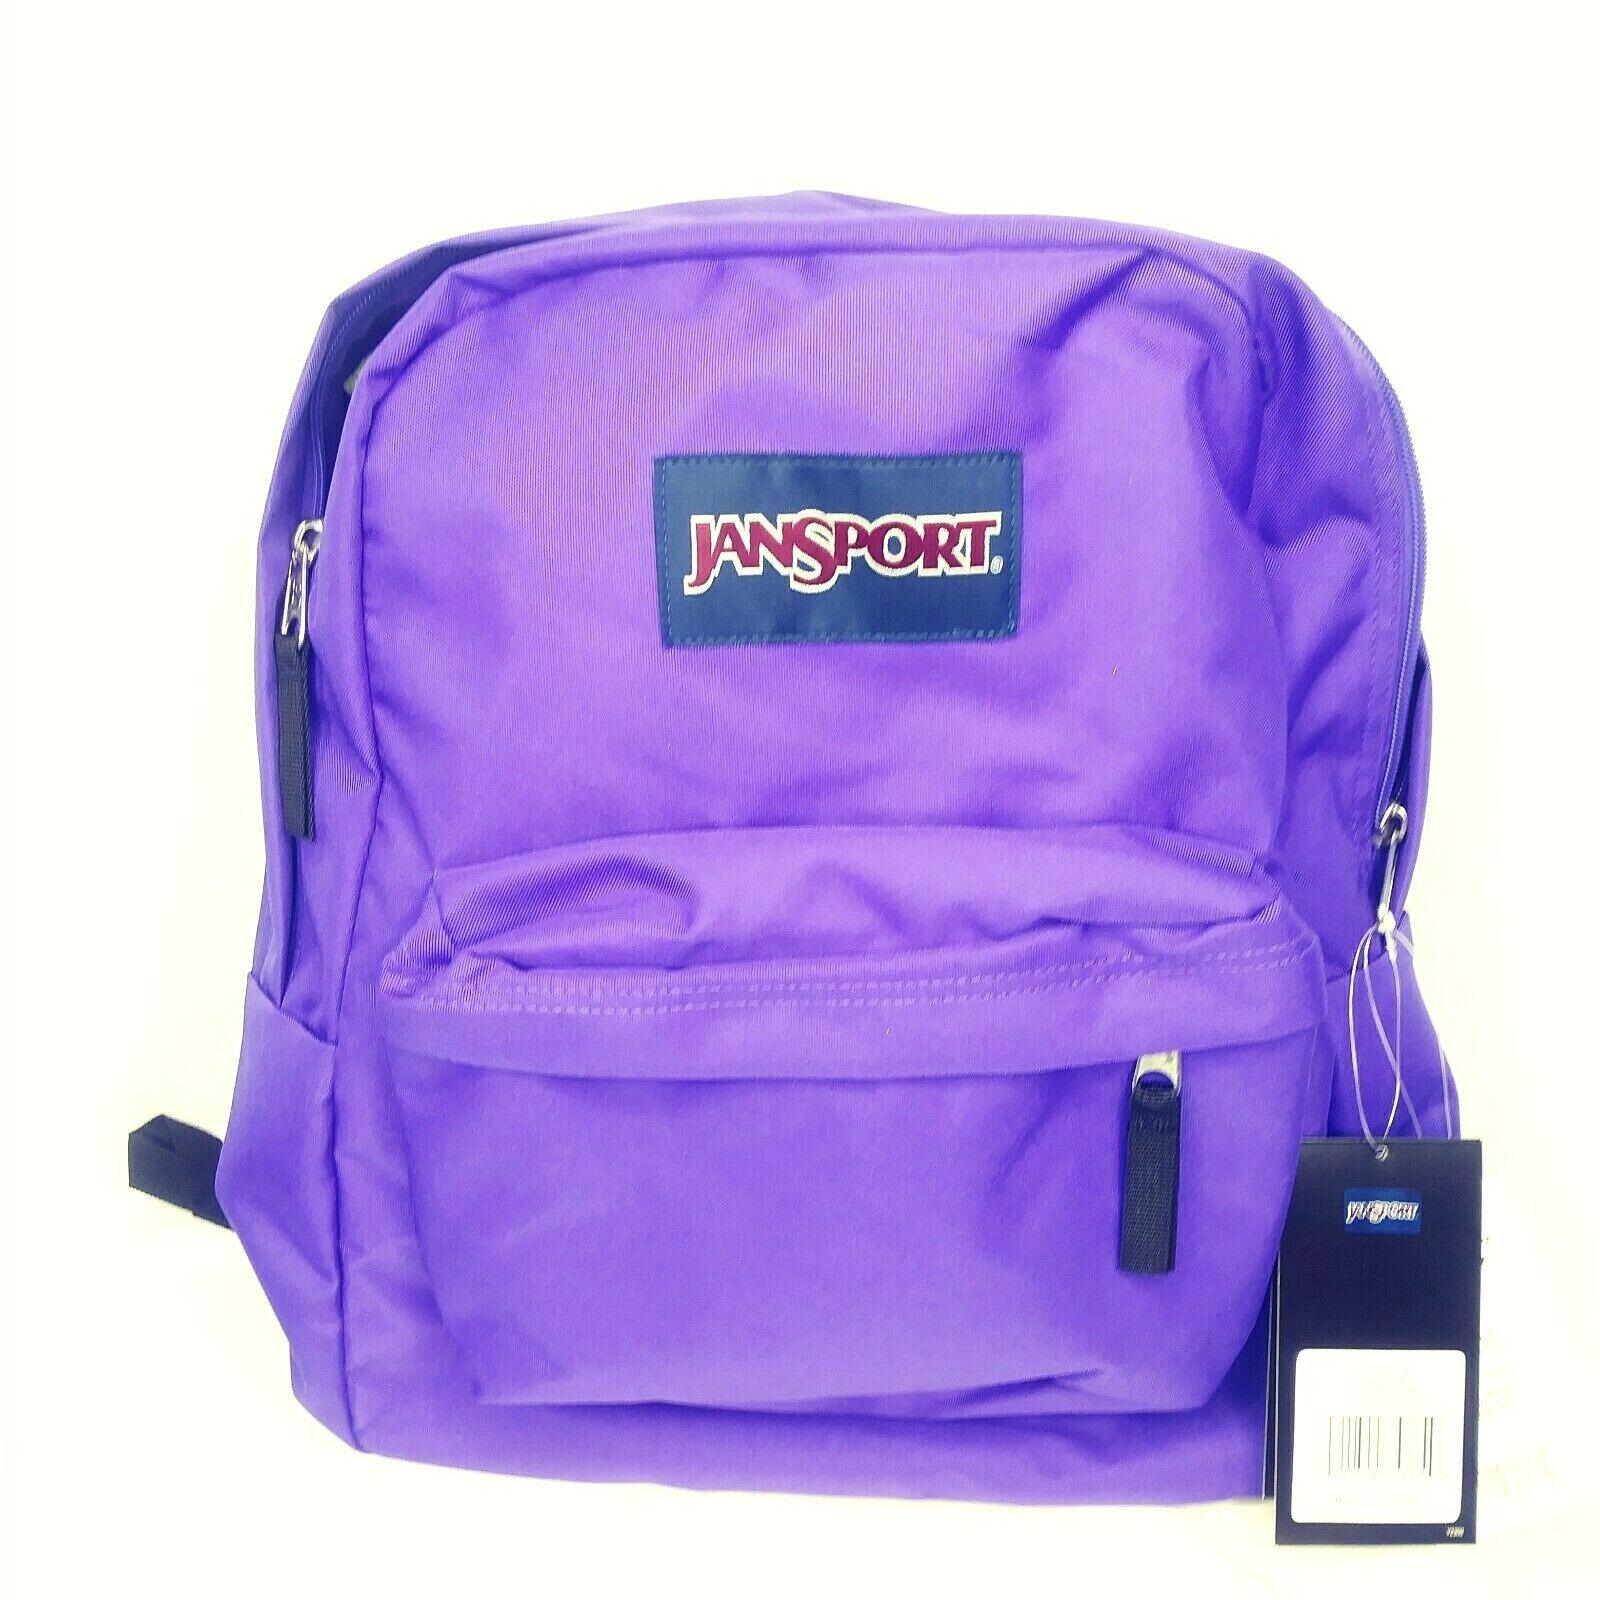 JanSport Superbreak Backpack Bookbag Insignia Purple with Bl